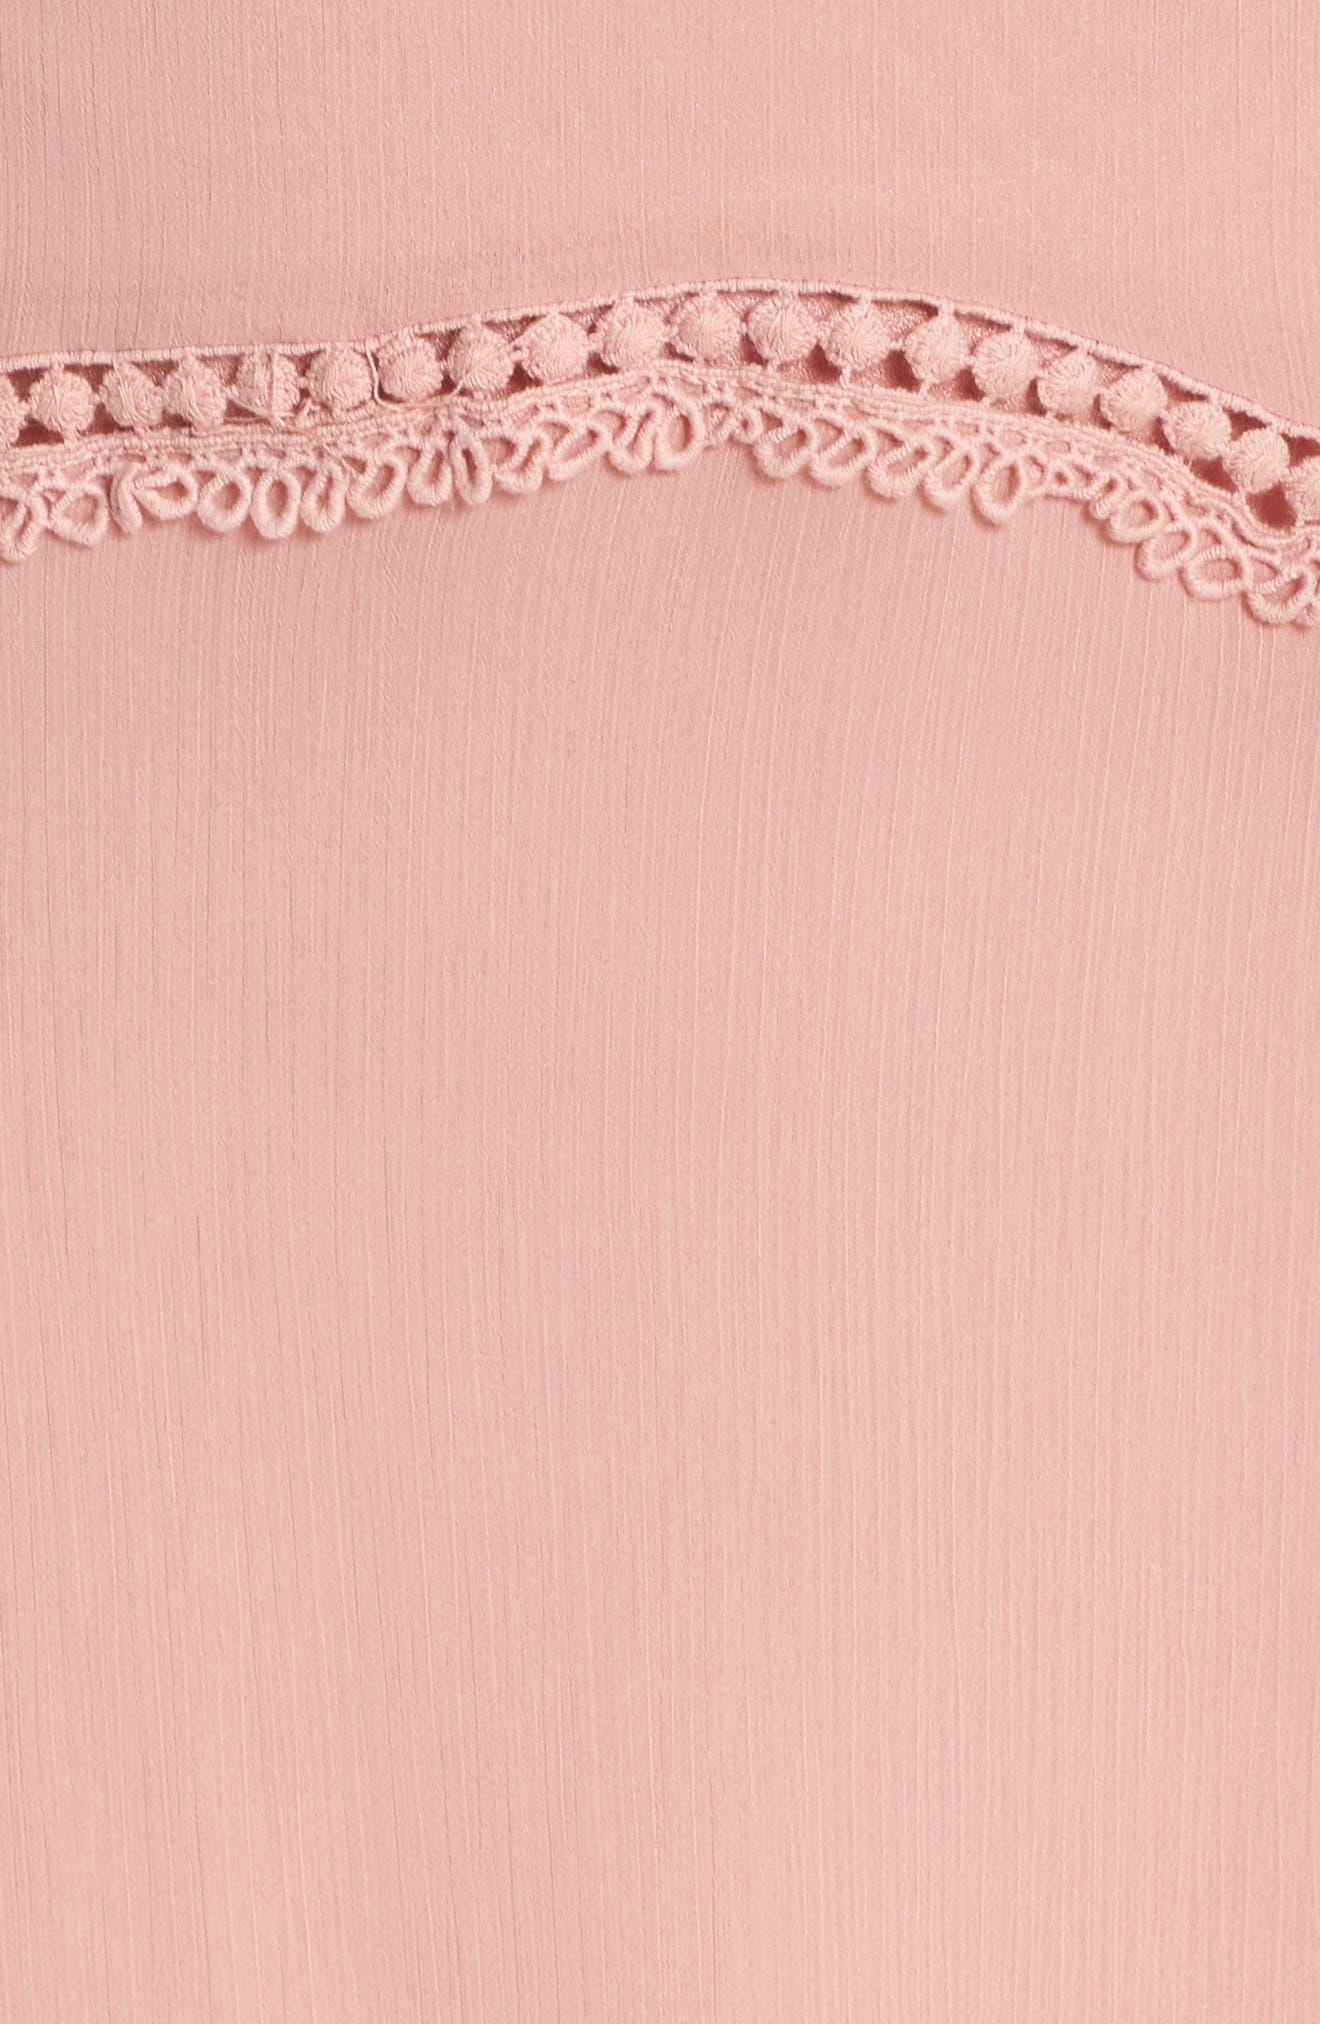 Picot Trim Maxi Dress,                             Alternate thumbnail 6, color,                             650